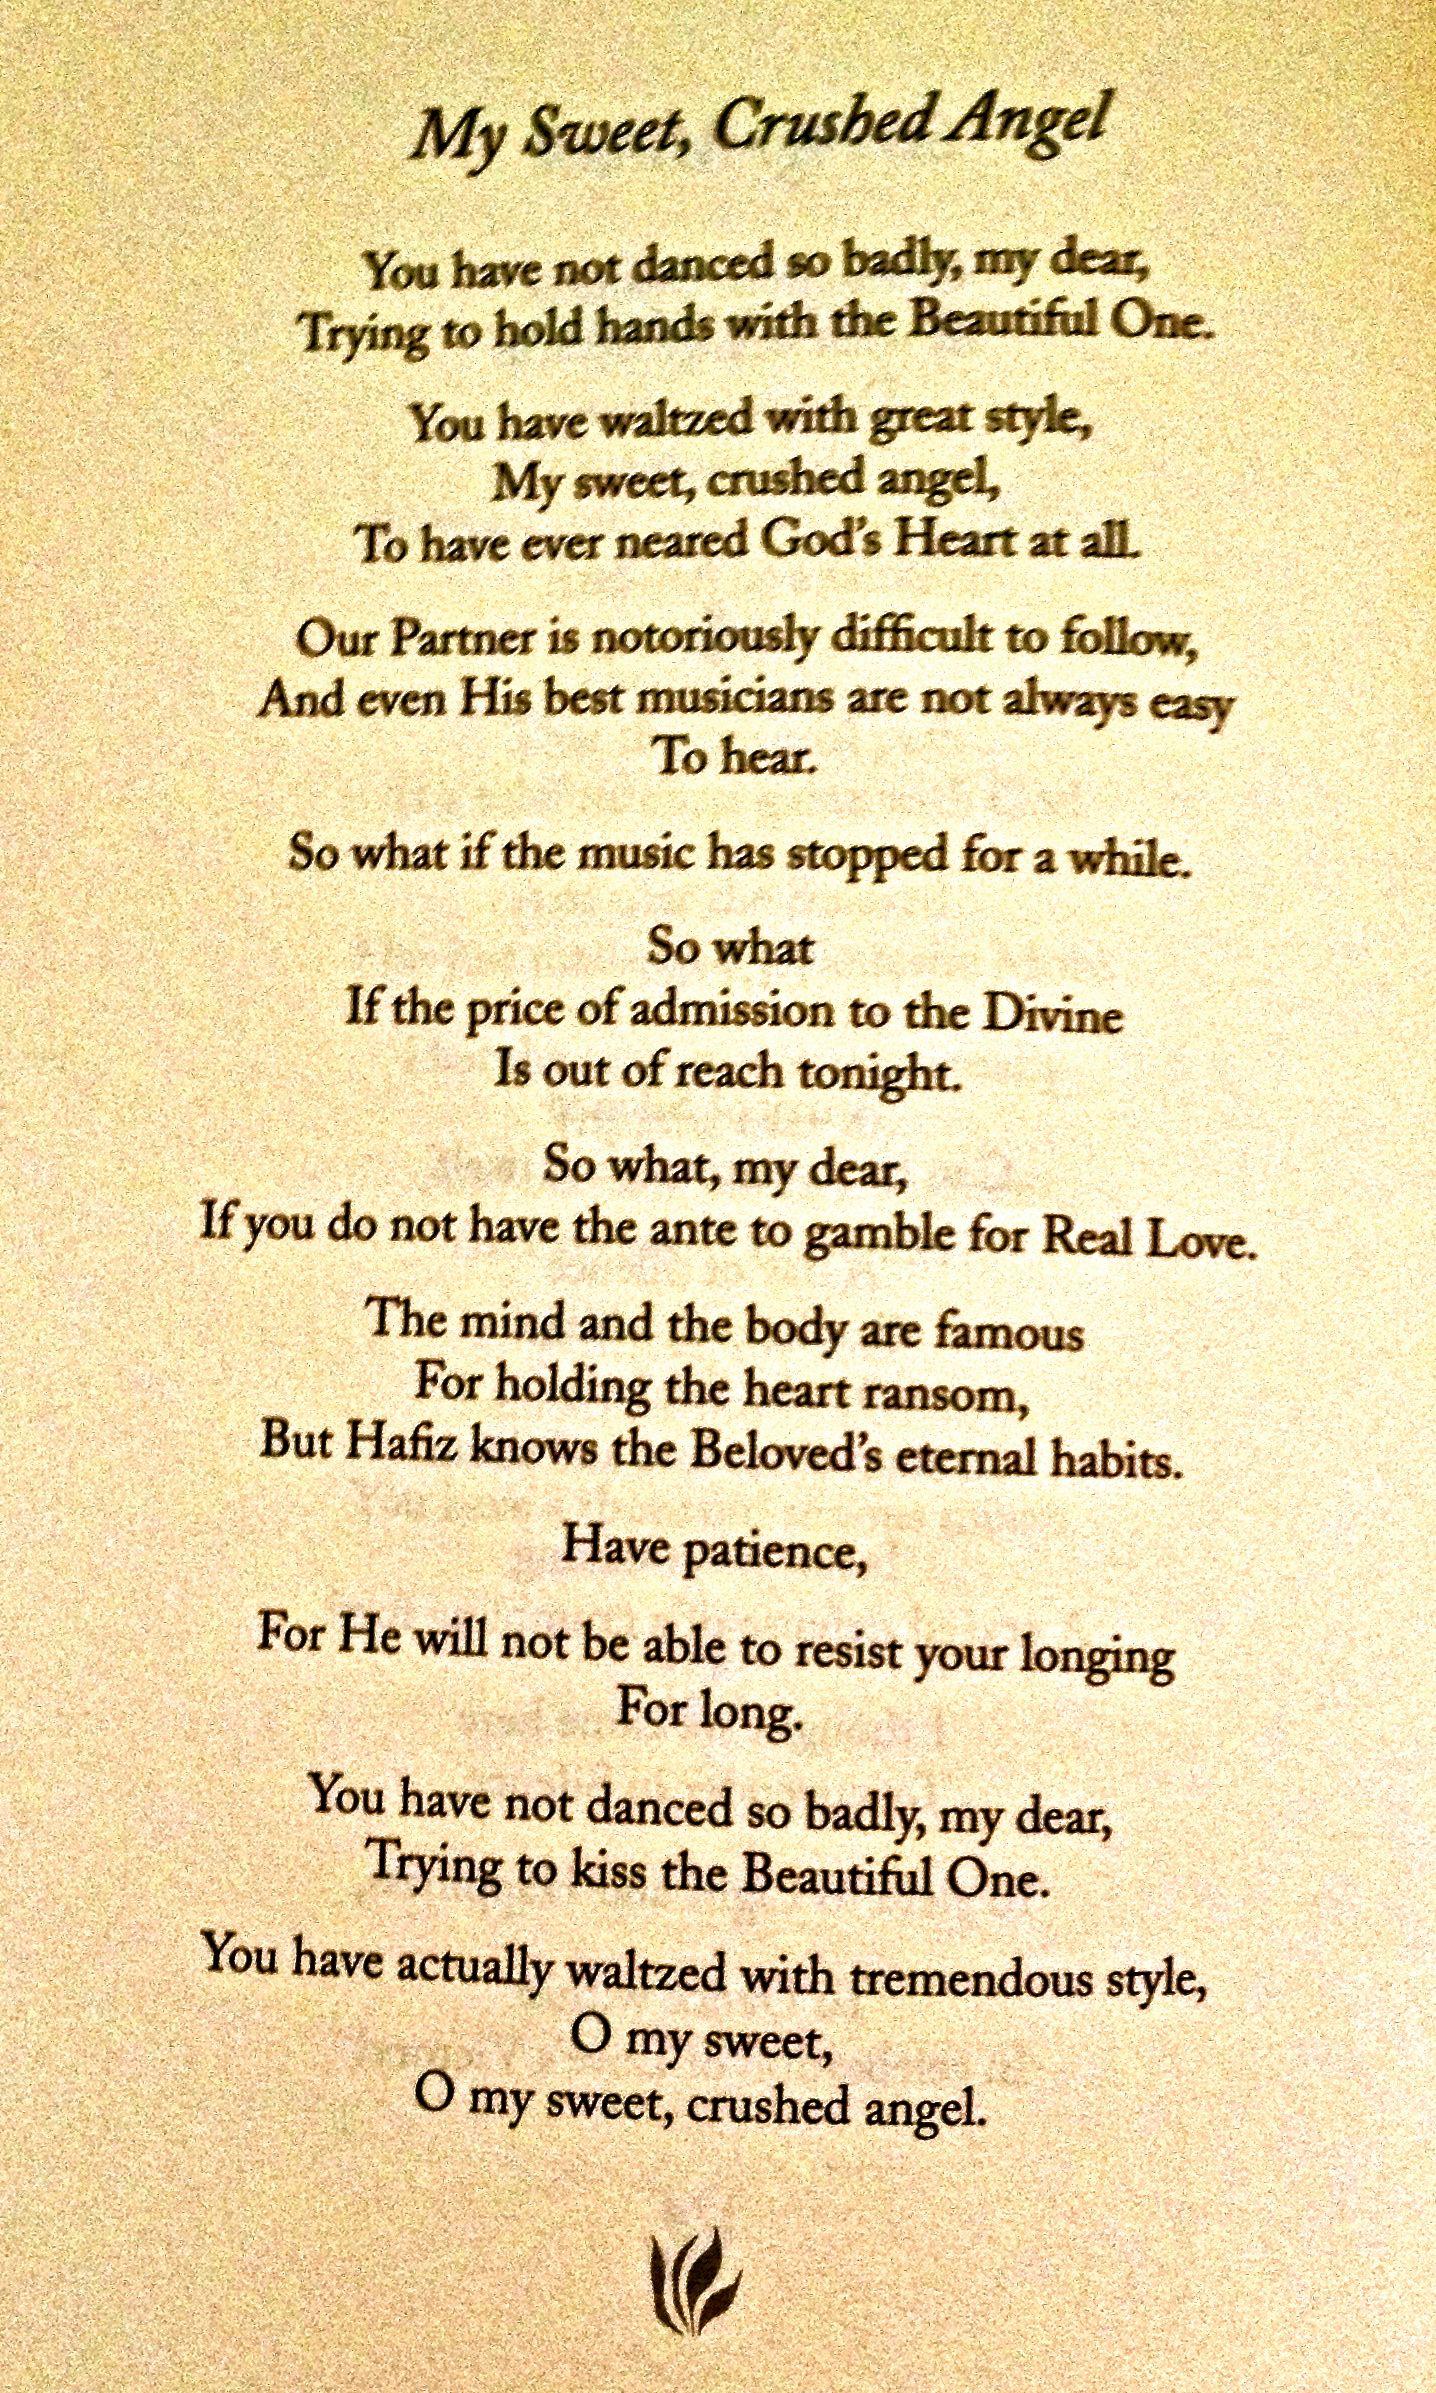 My sweet crushed angel poem hafiz hafiz pinterest for Hafiz gedichten